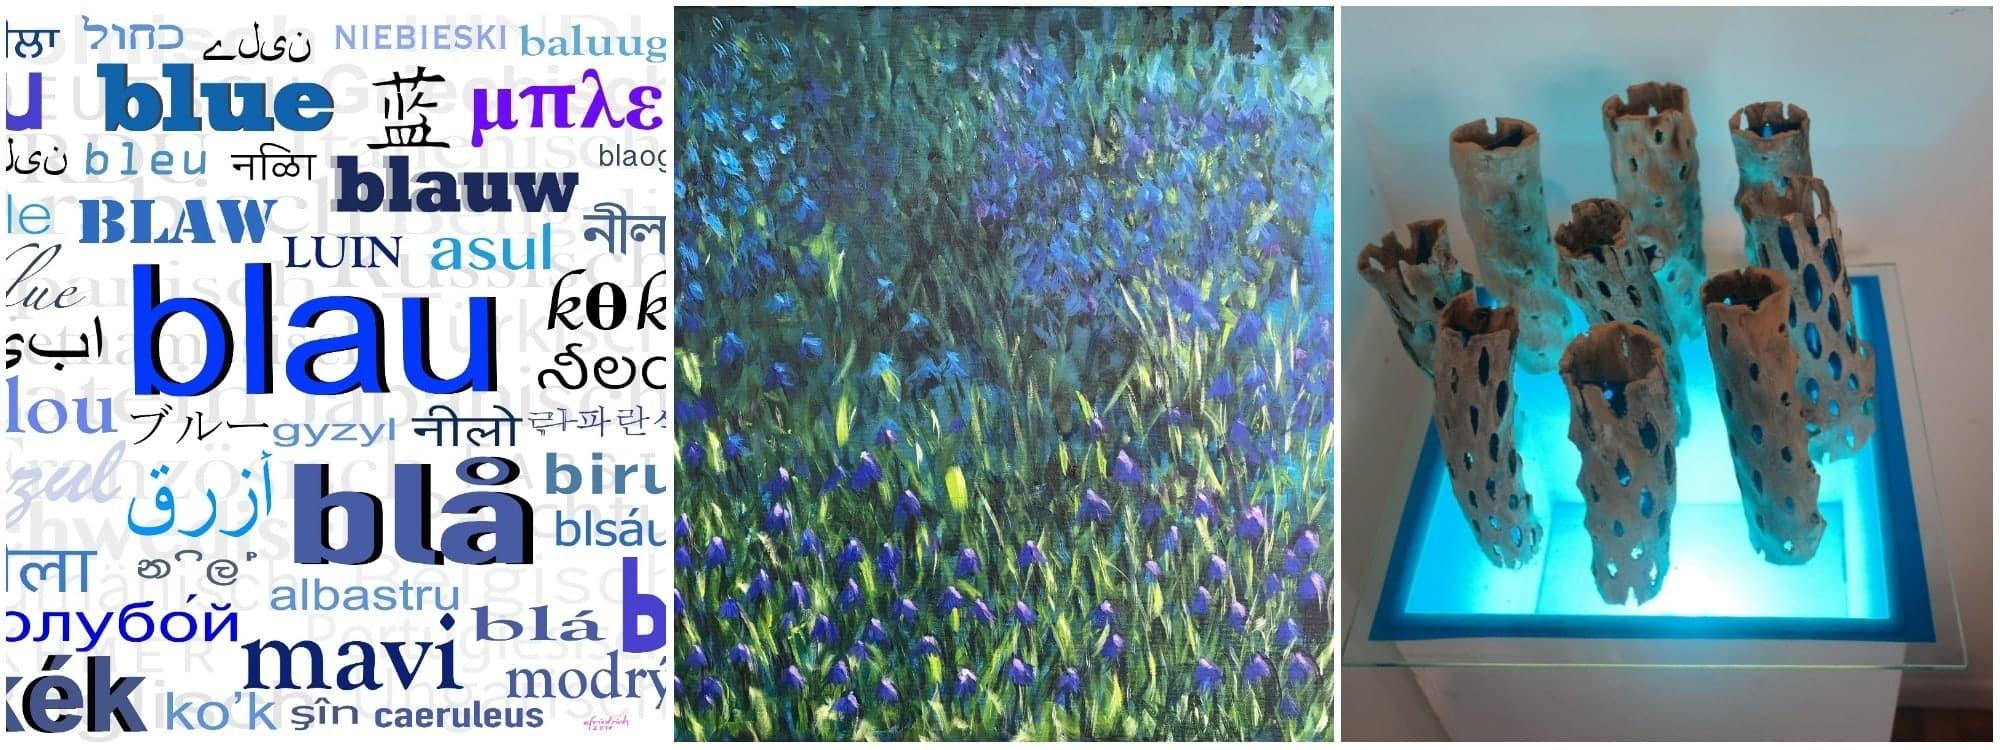 "Style Hannover Blaues Band Collage EF AK BE I - Ausstellung ""Das Blaue Band"" | BBK"